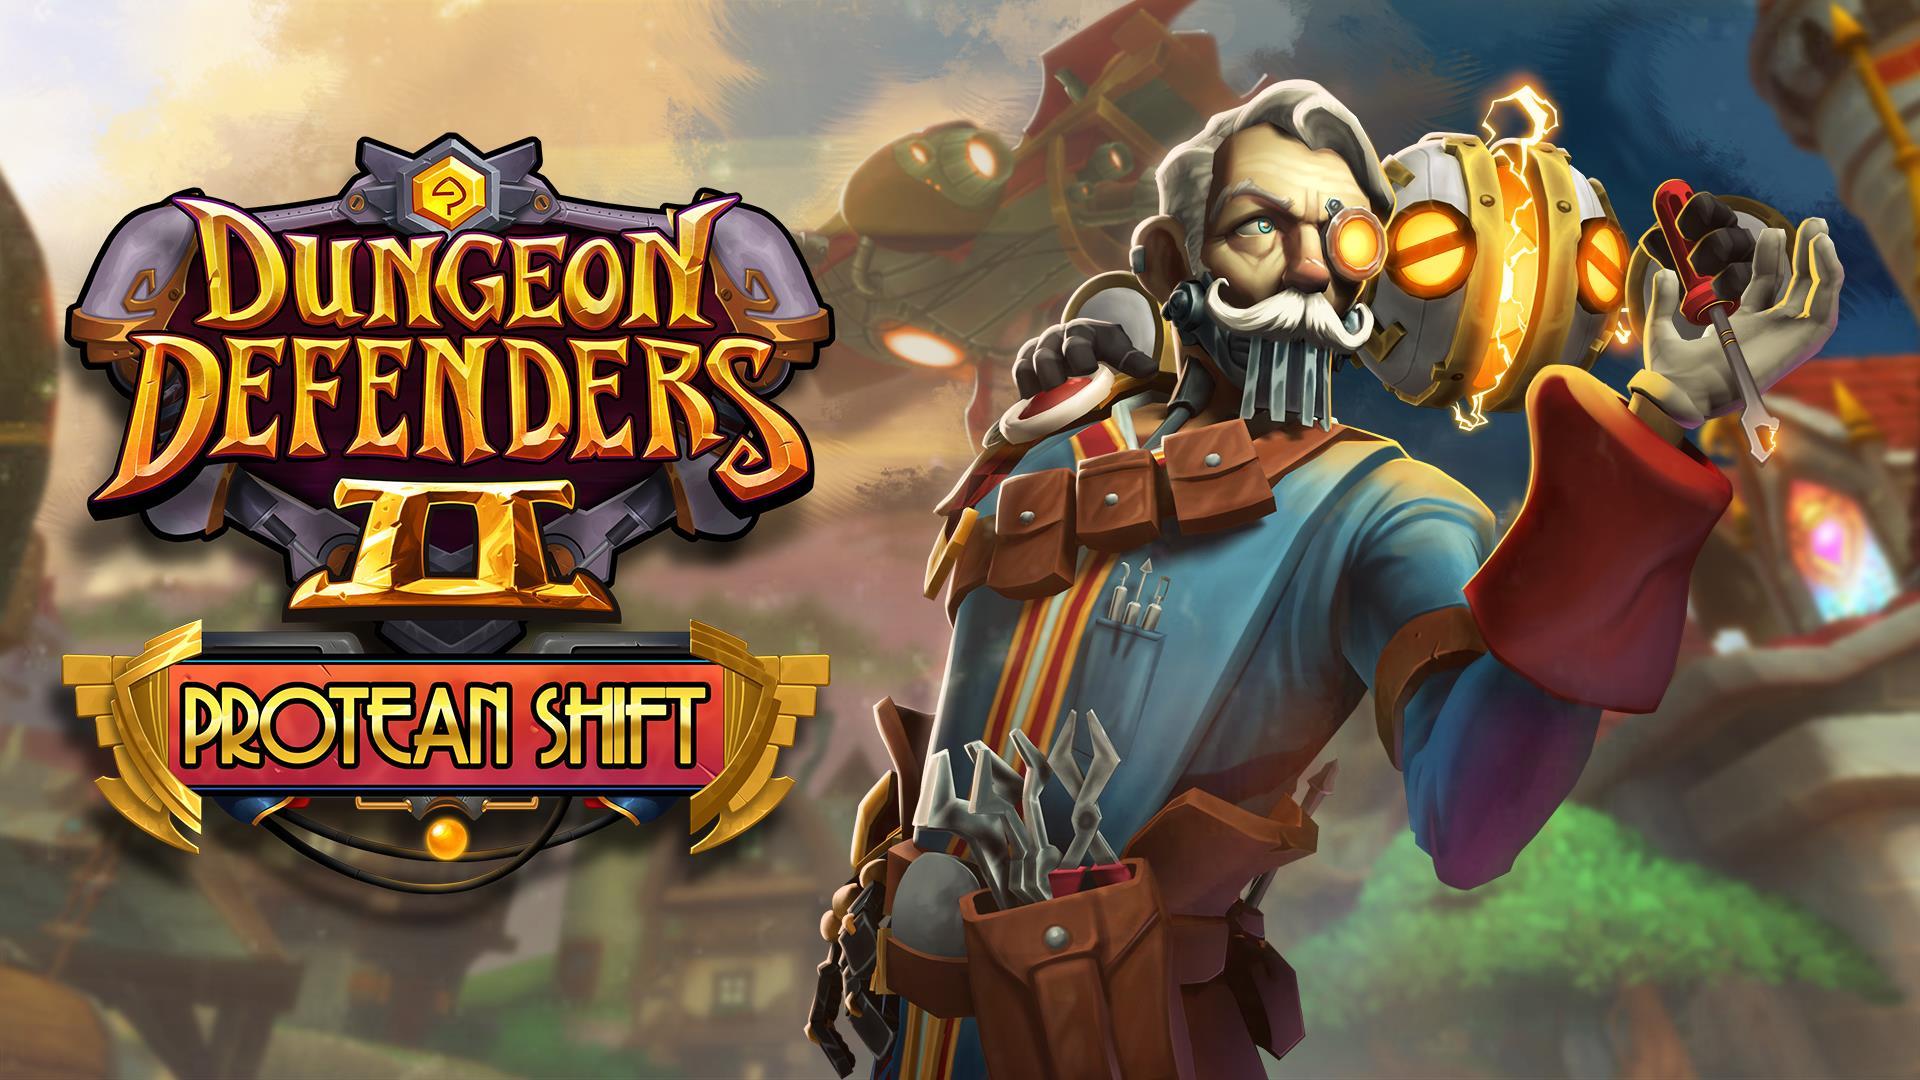 Dungeon Defenders on Twitter: